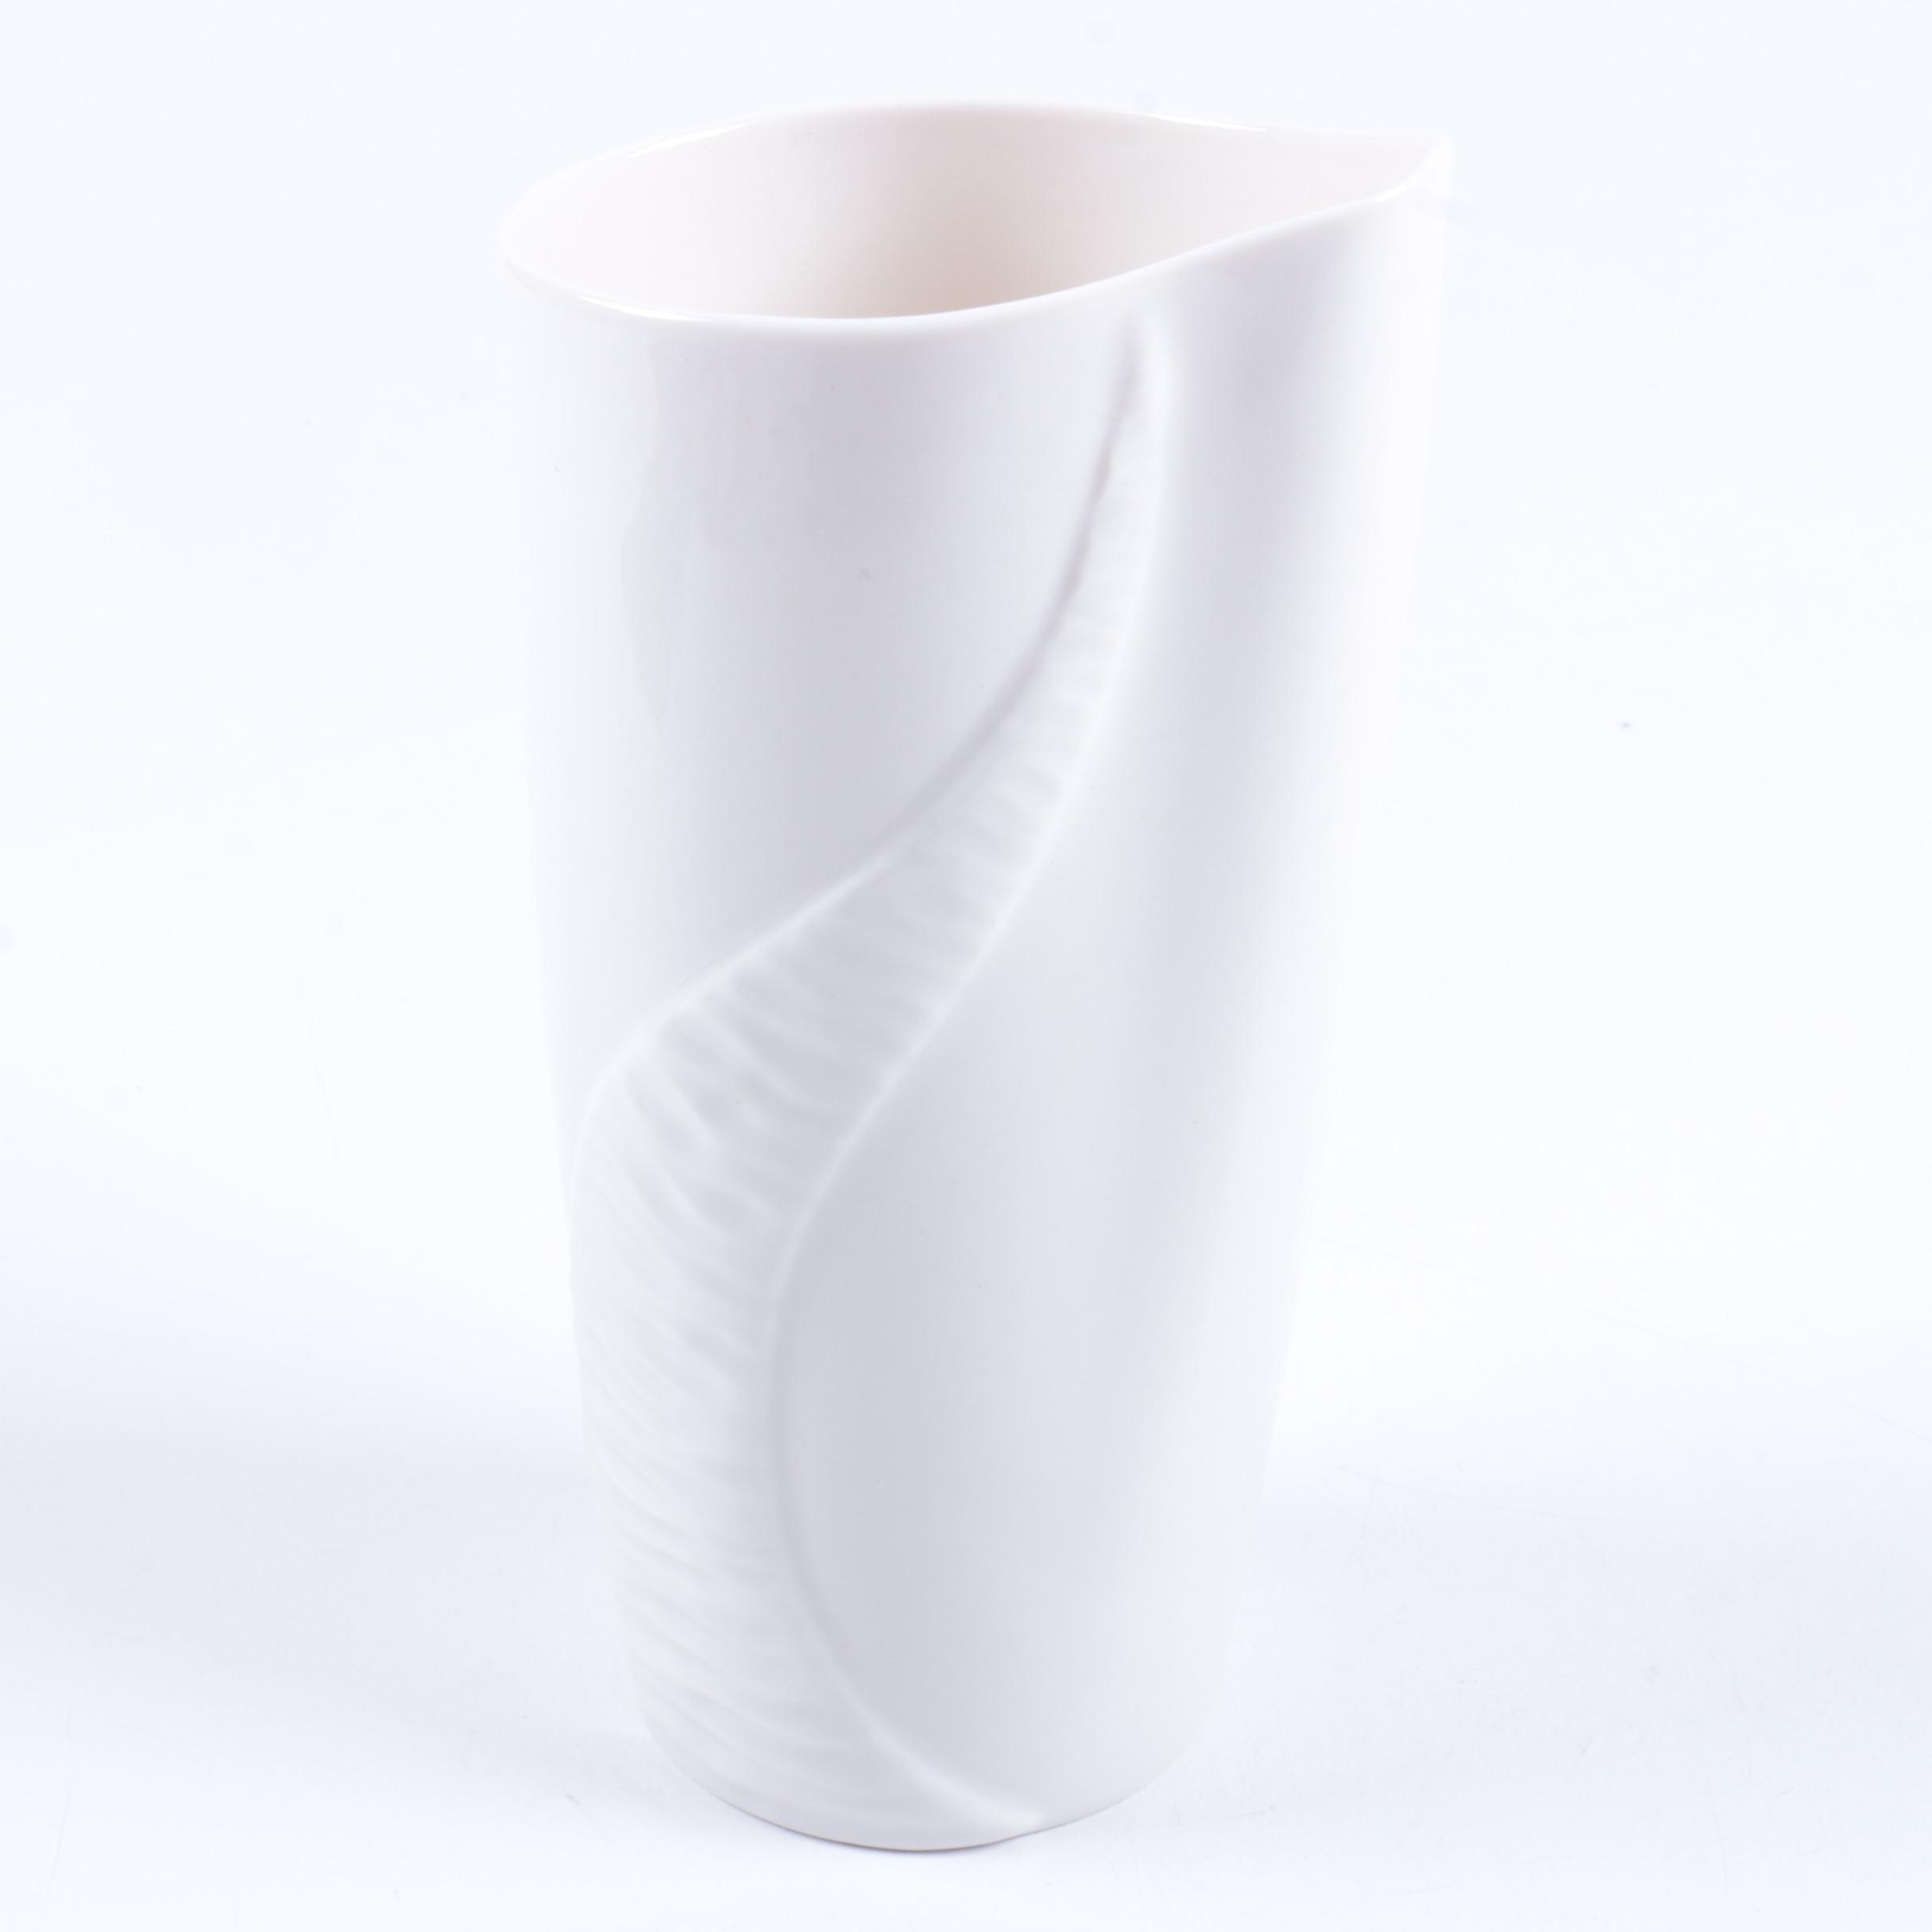 Belleek Decorative Porcelain Vase